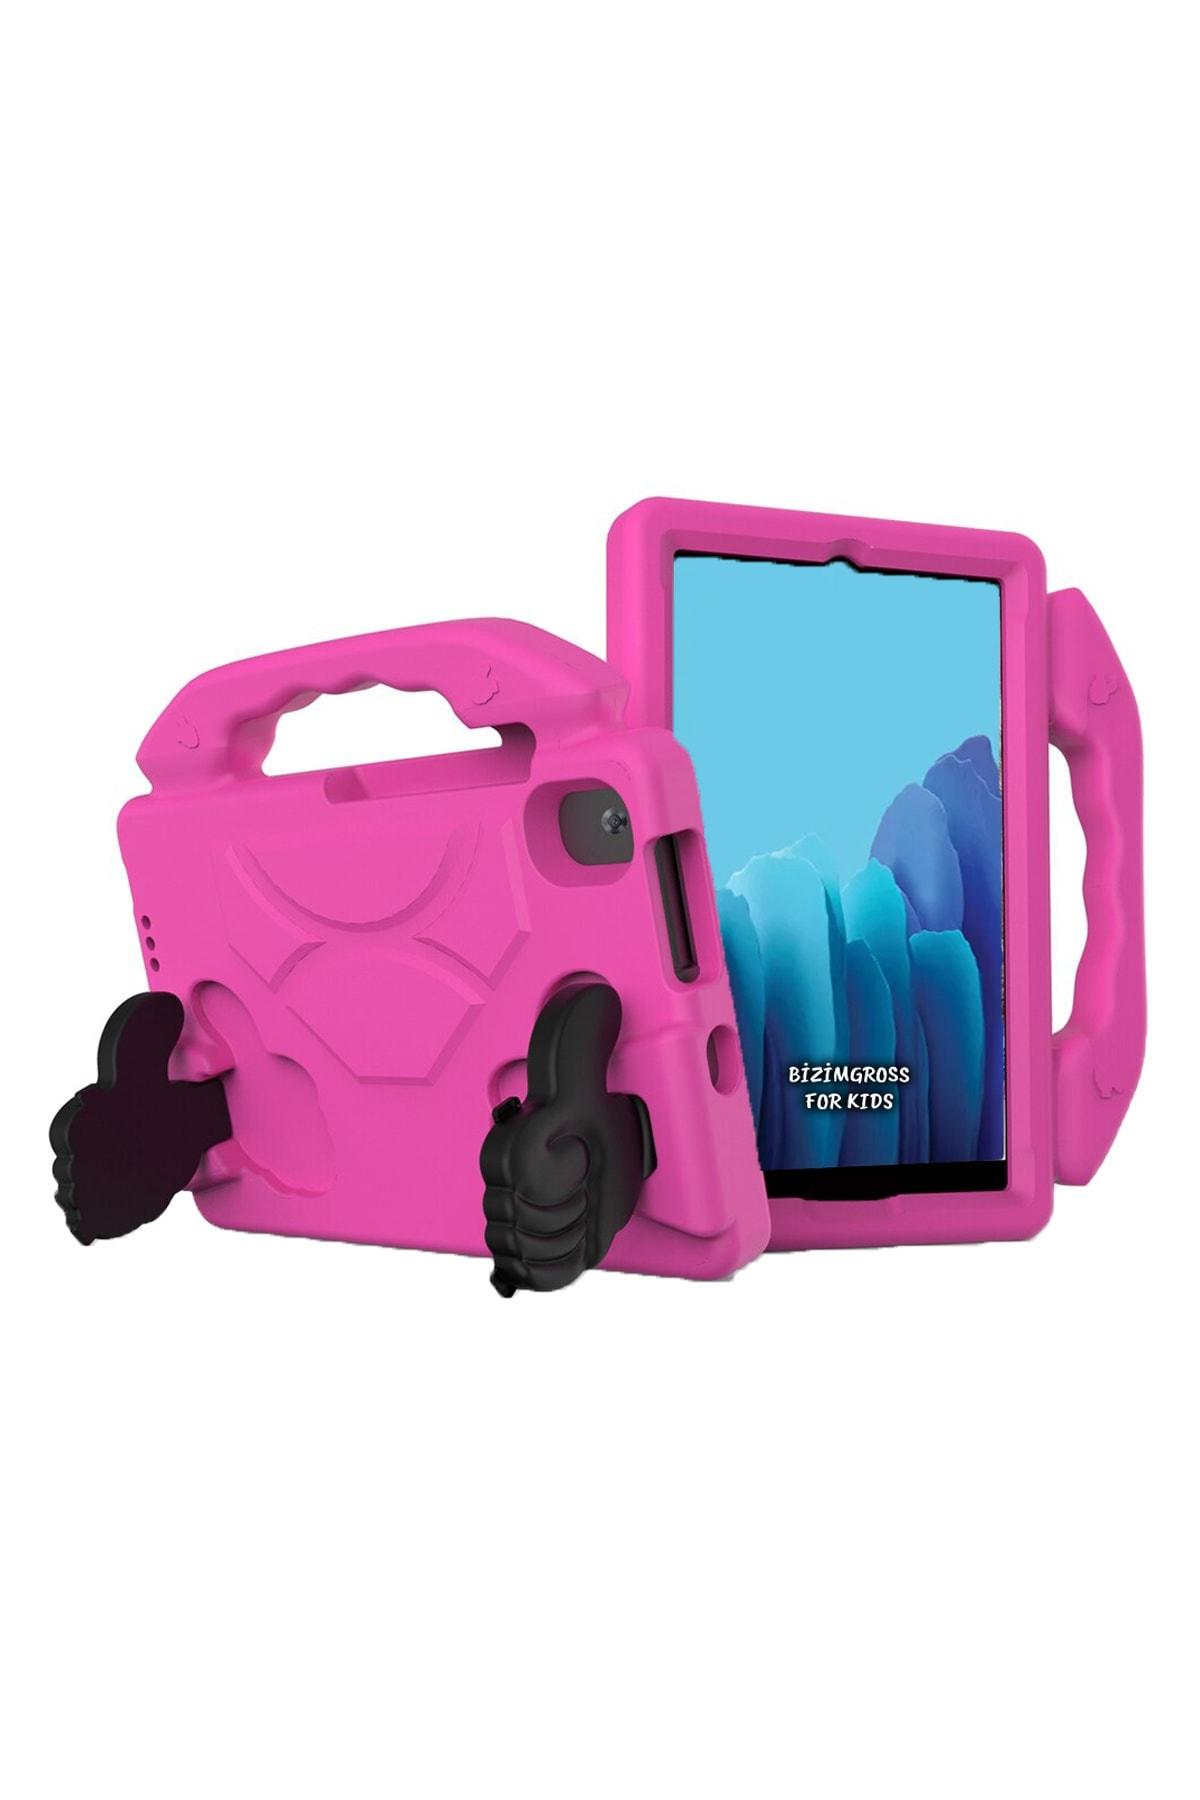 BizimGross Apple Ipad Air Pro (2016) 9.7 Inç A1673, A1674, A1675 Çocuklar Için Standlı Tablet Kılıfı 1